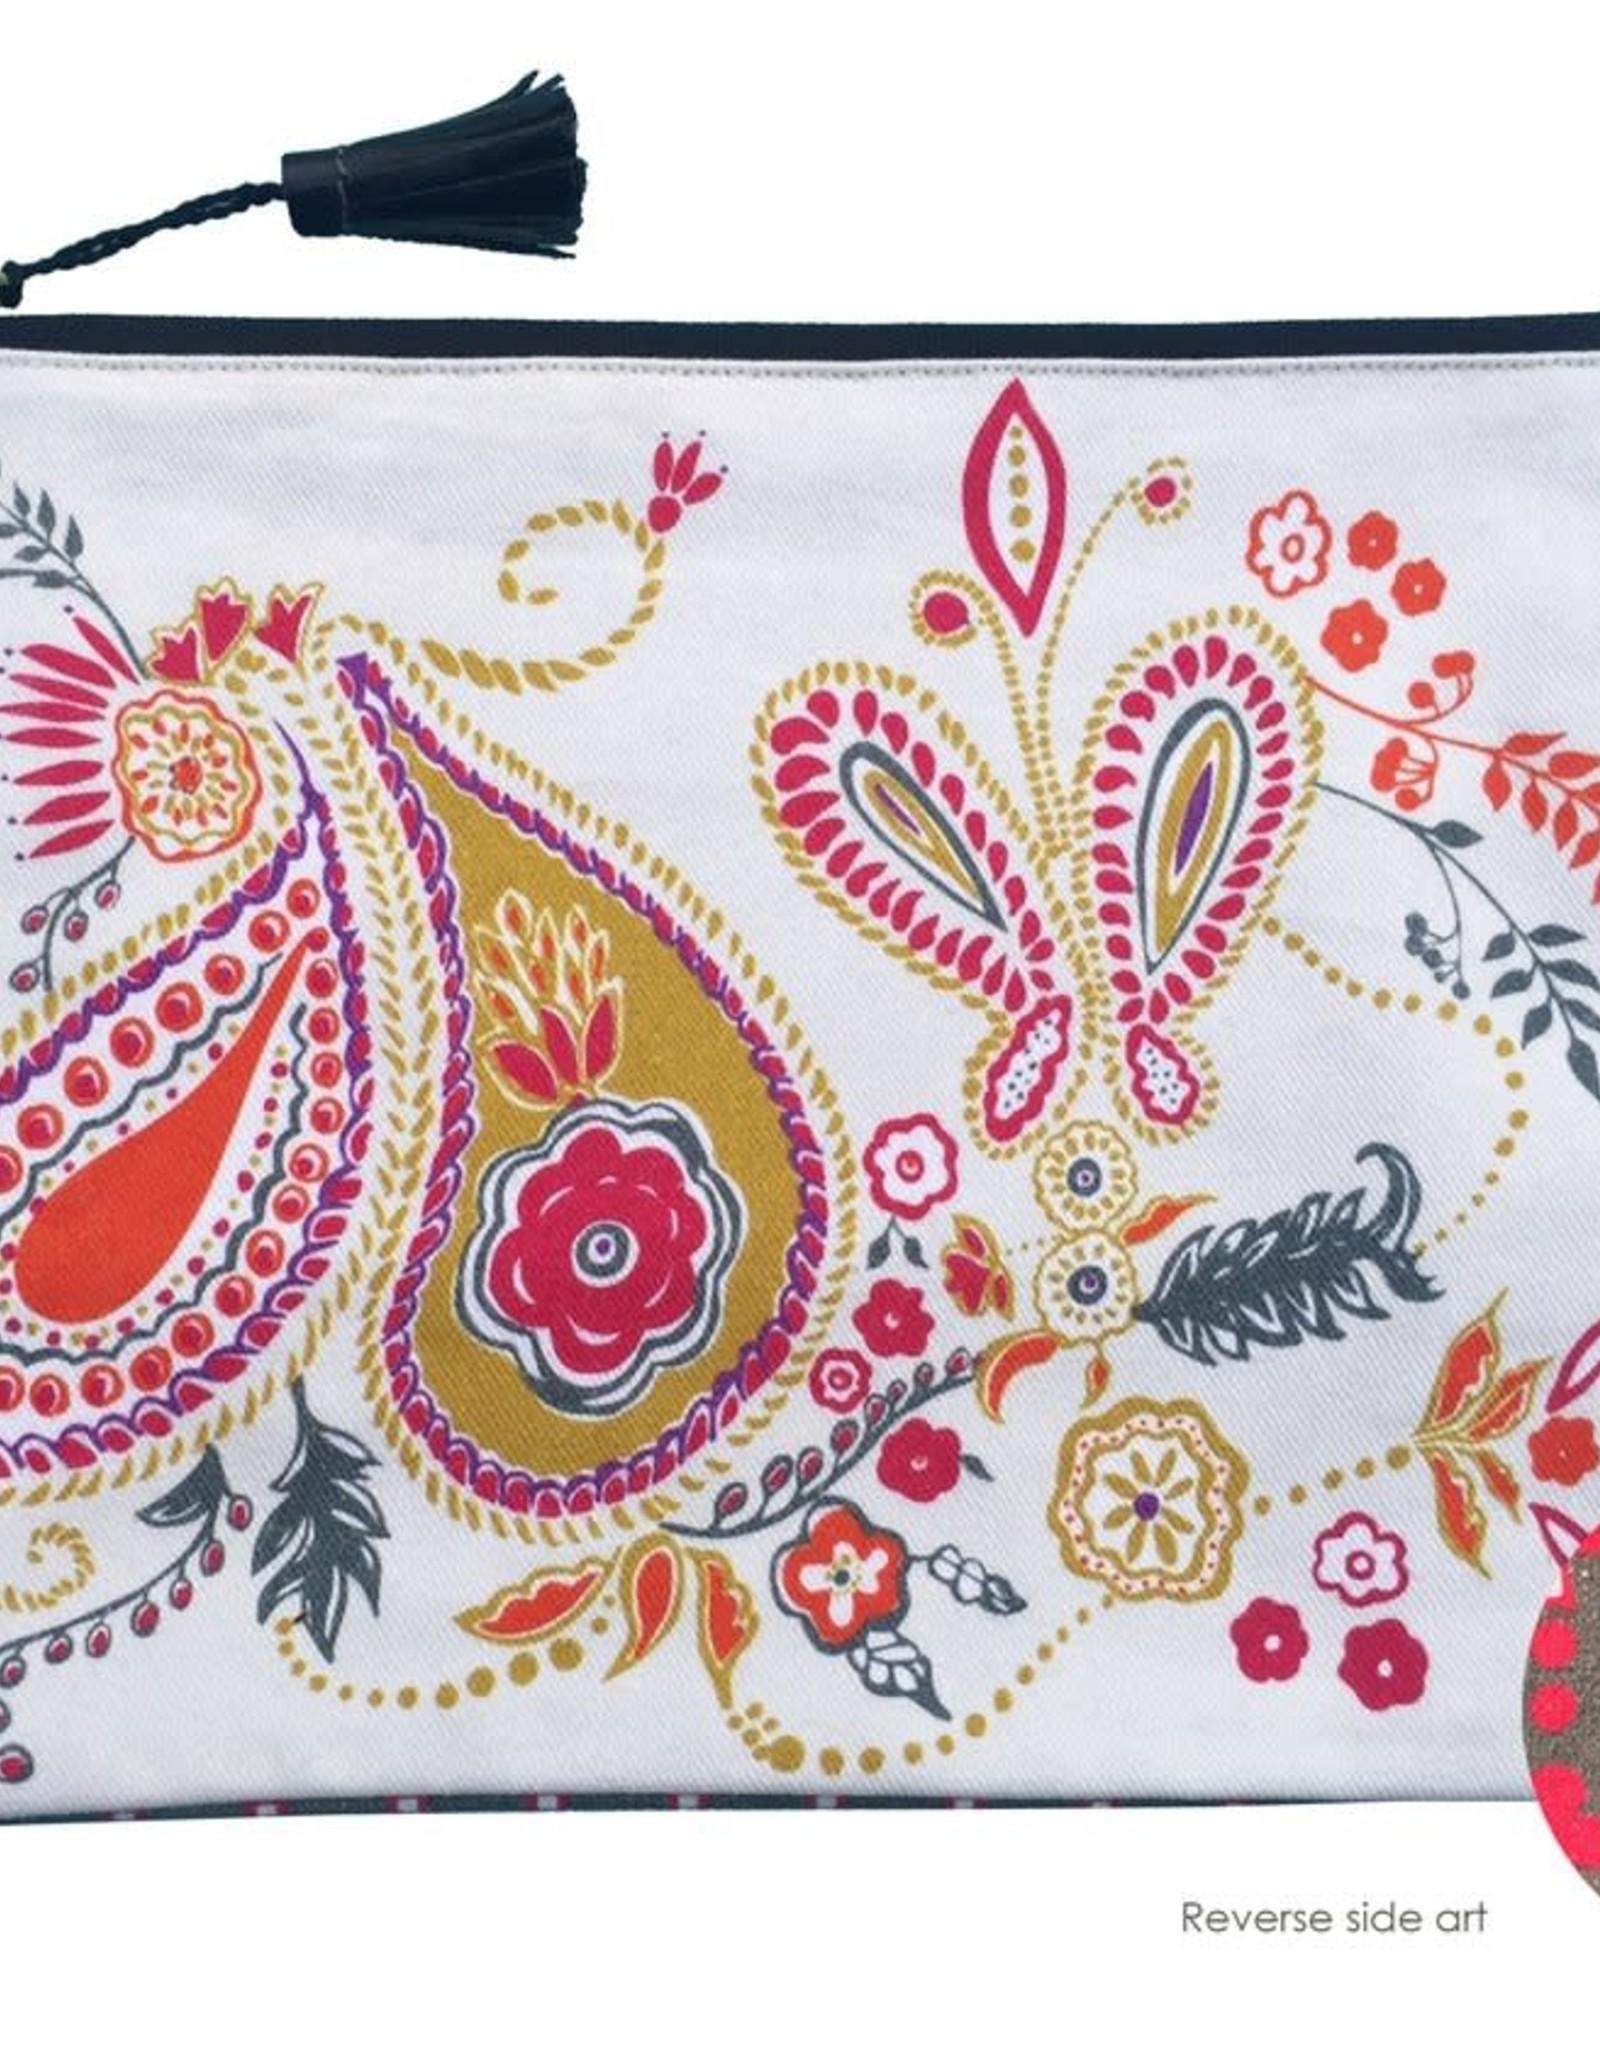 SIP Goods Sip Carnaby Clutch Bag